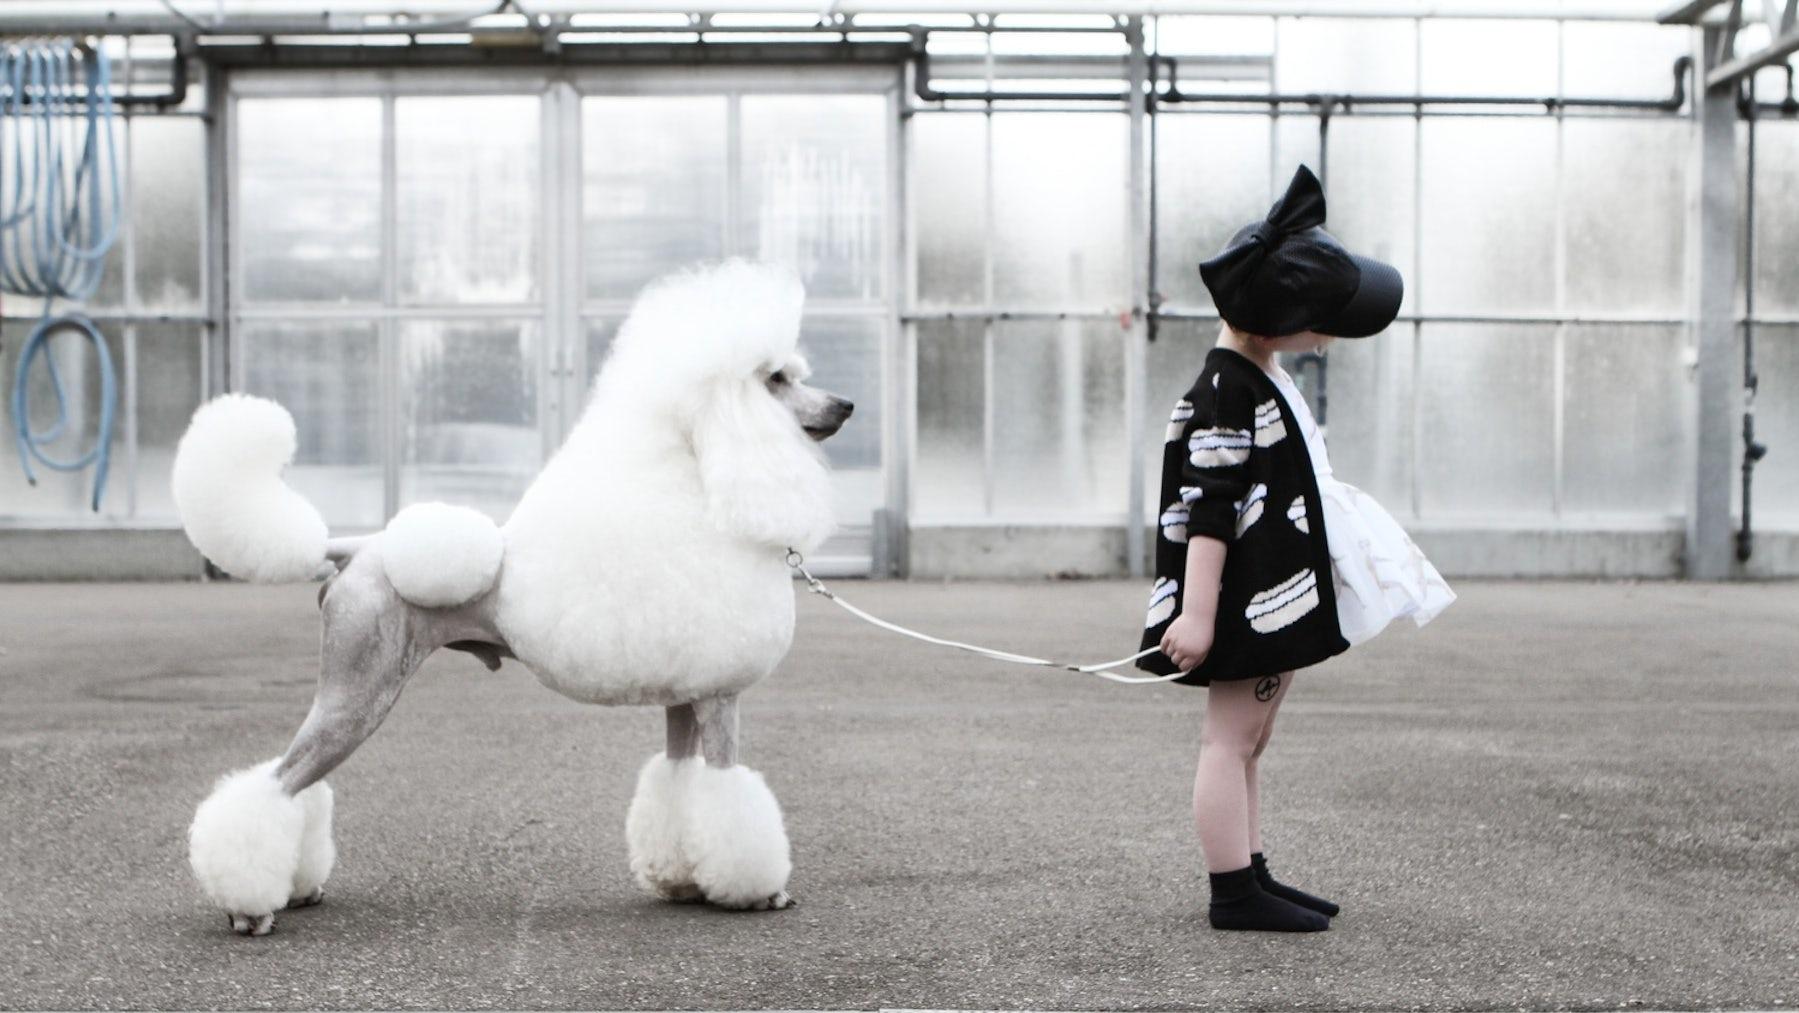 The 'Fashionisation' of Childrenswear